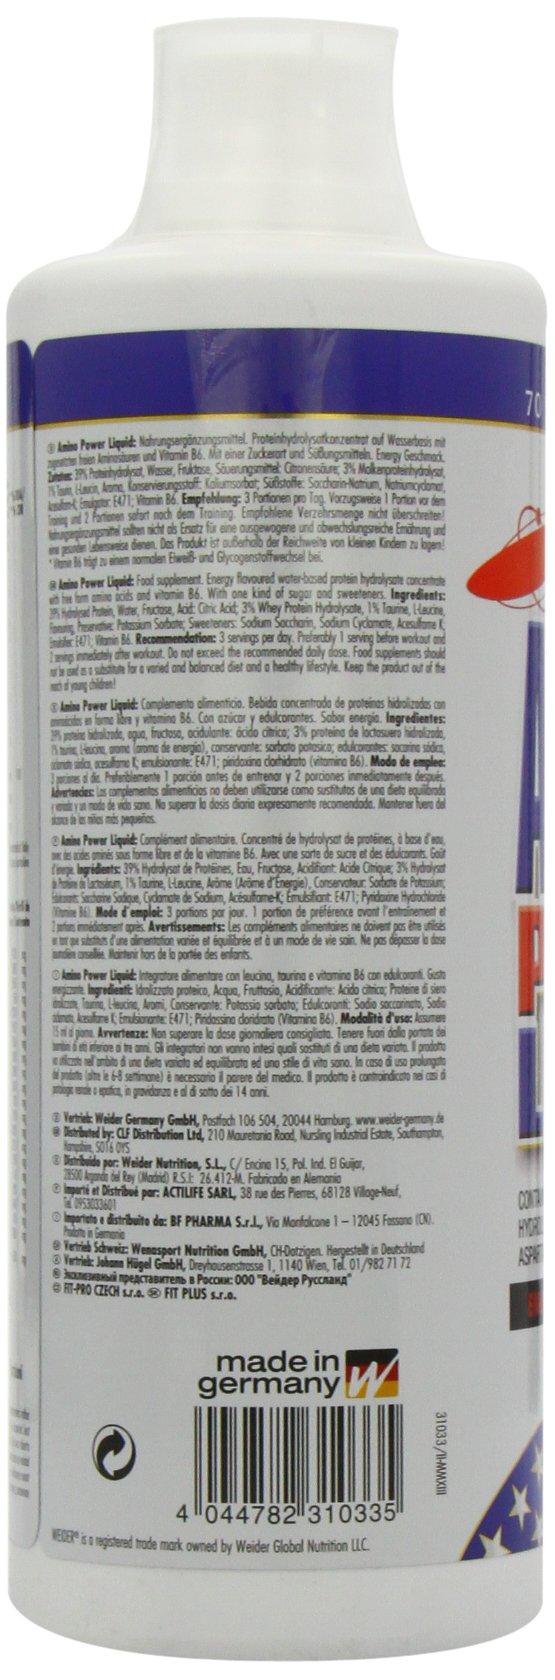 71sPXEC2nqL - Weider Amino Power Liquid 1L Energy, Essential Amino Acids, L-leucine, Free Taurine, Vitamin B8